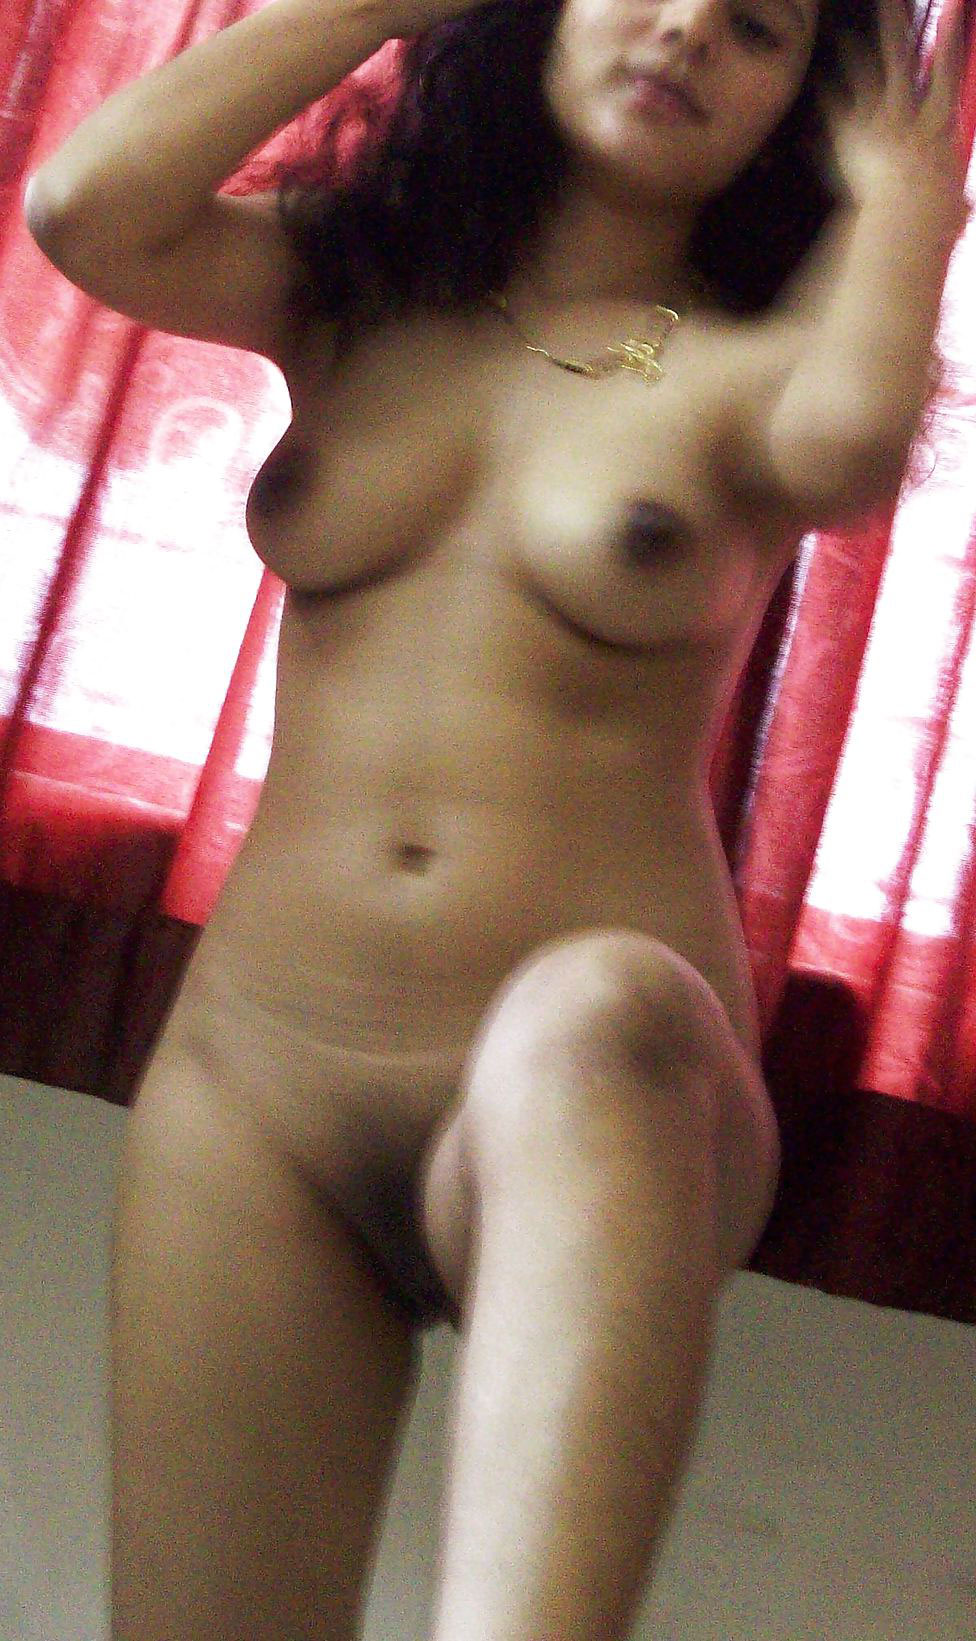 Indian full porn